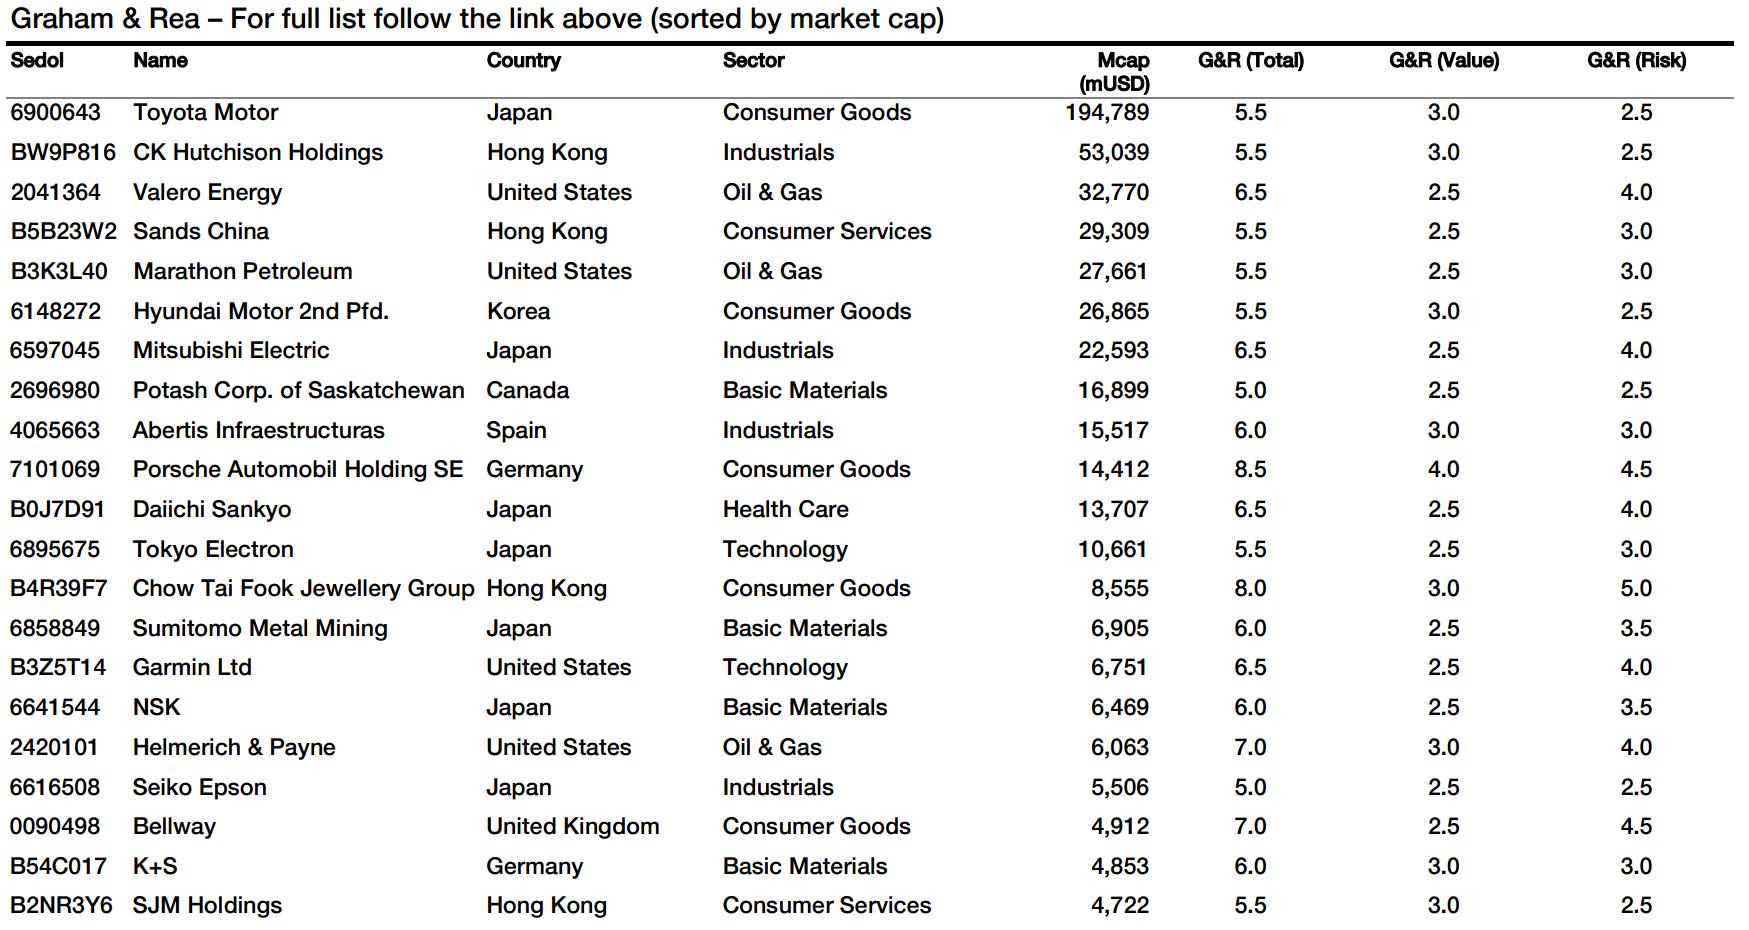 41 Deep Value Stocks Meeting Benjamin Graham Standards